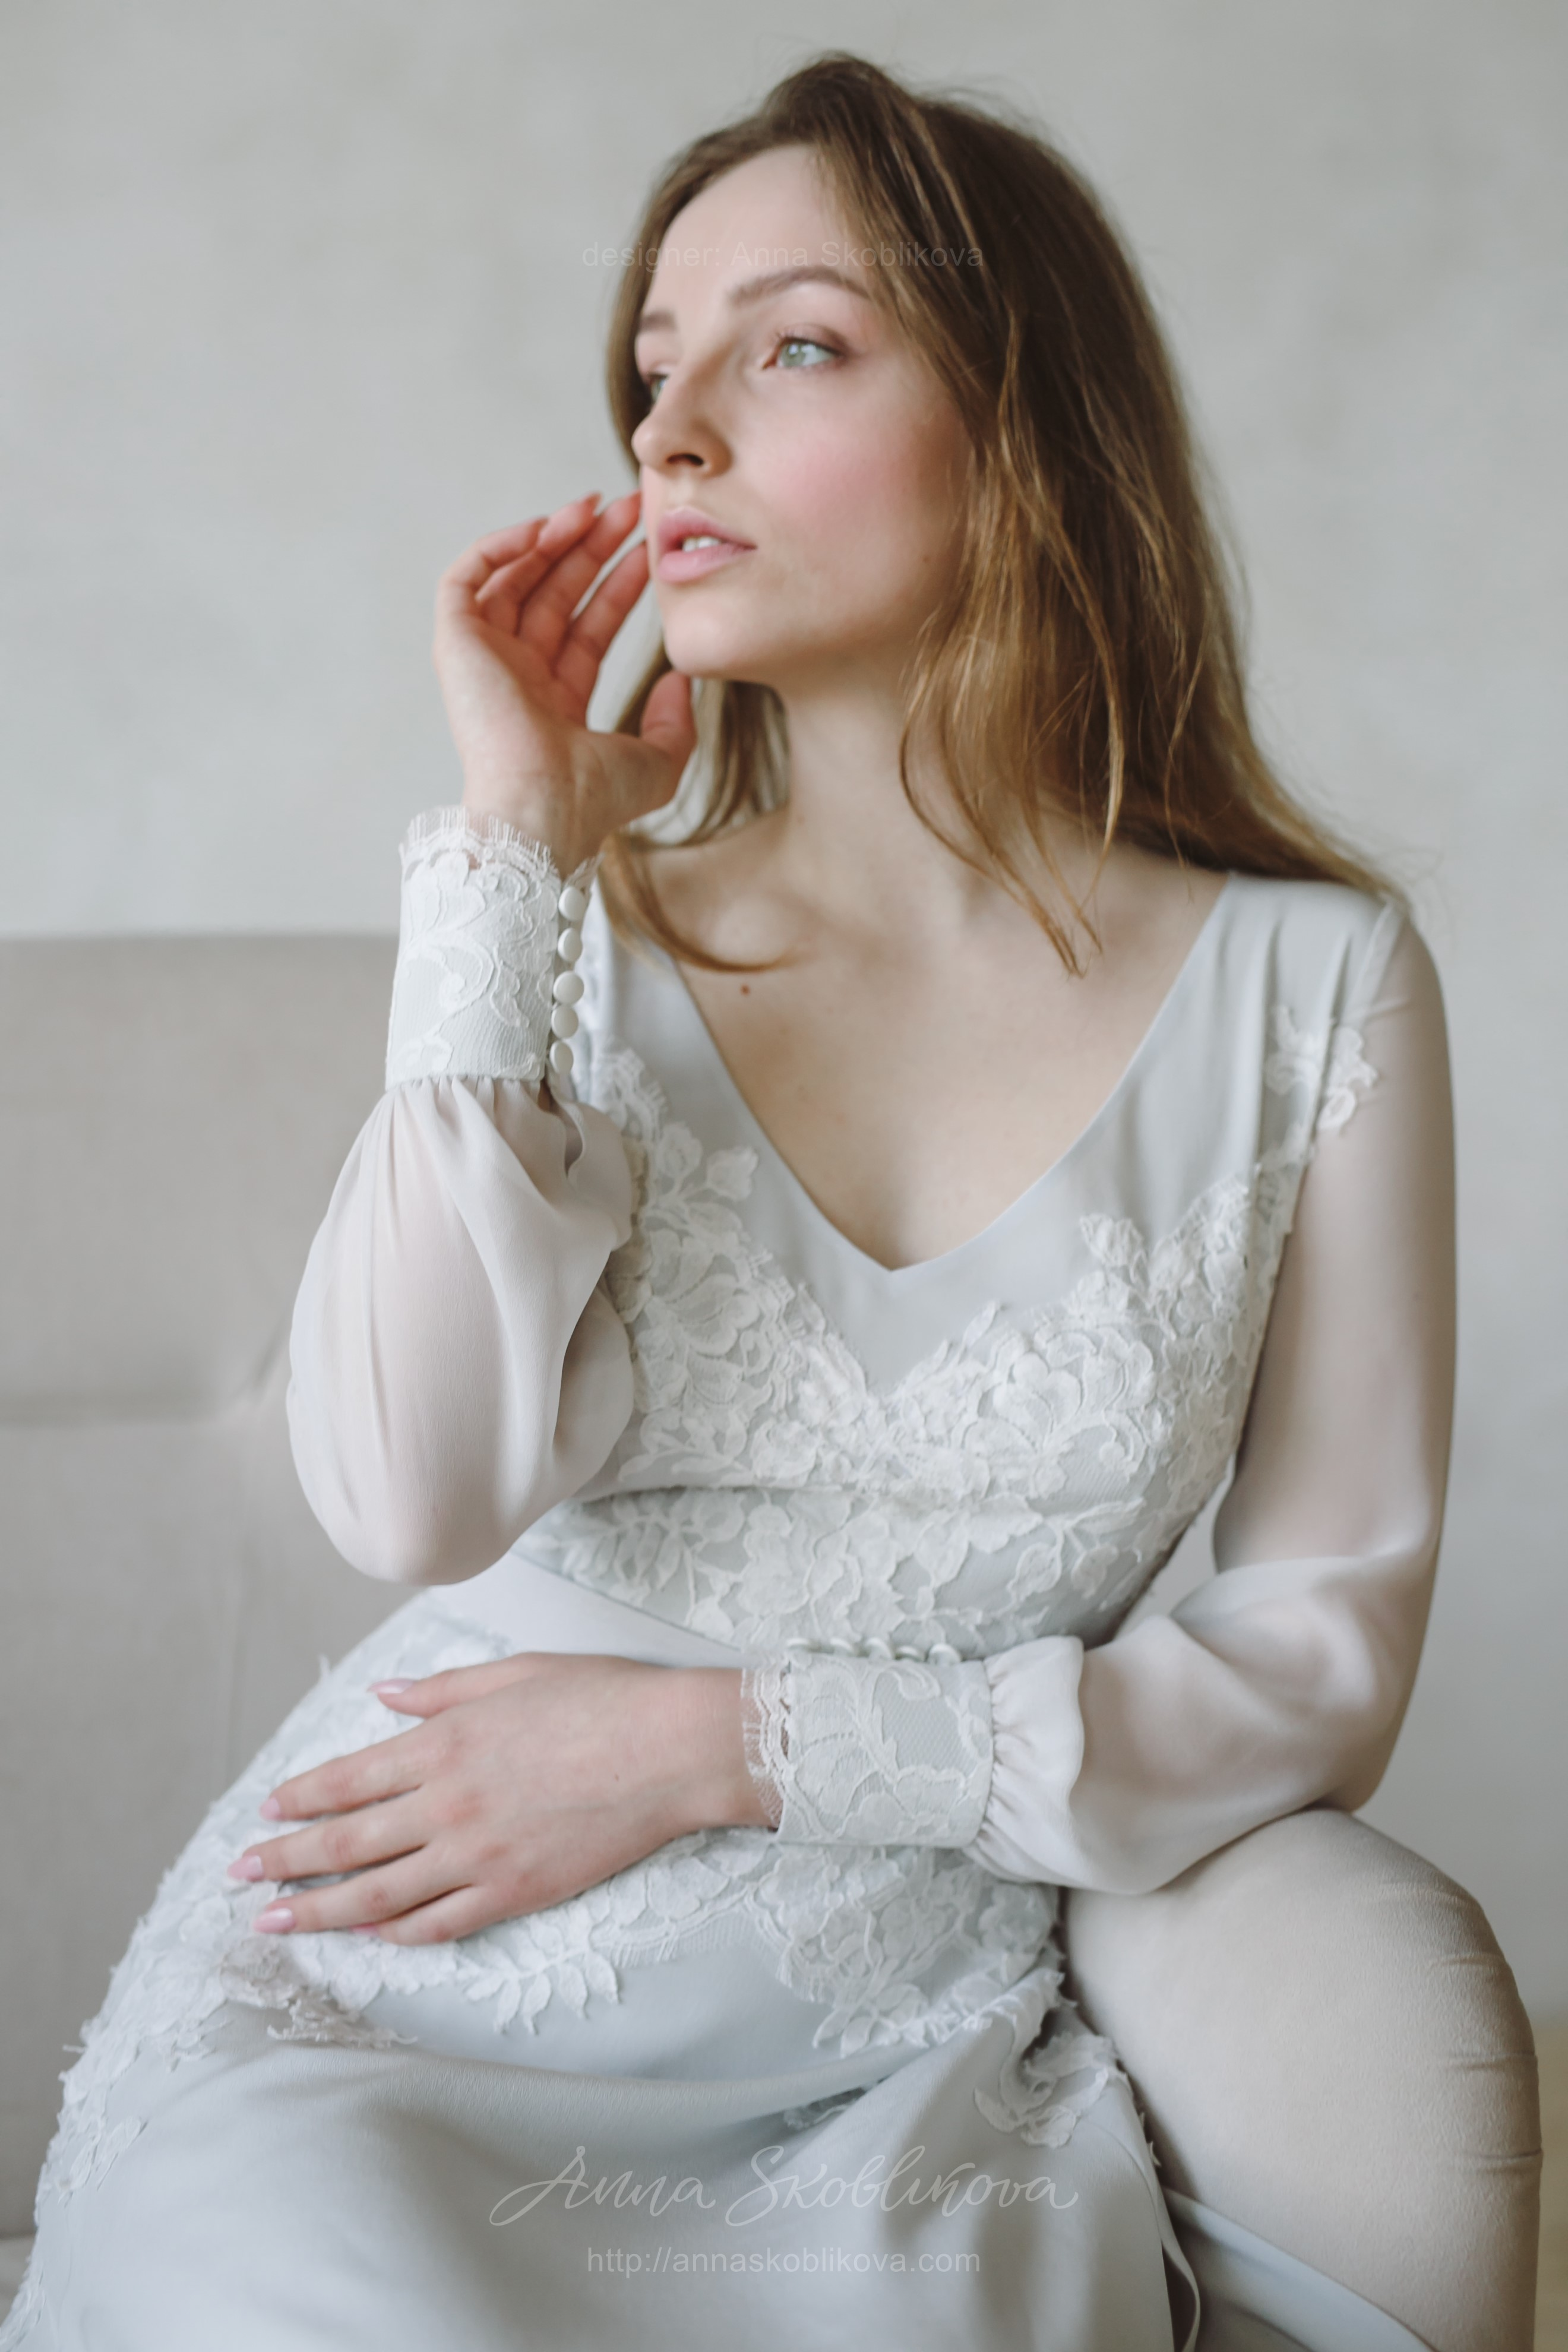 Bohemian Wedding Dress Boho Anna Skoblikova: Wedding Dresses With Pink Blue Accents At Websimilar.org